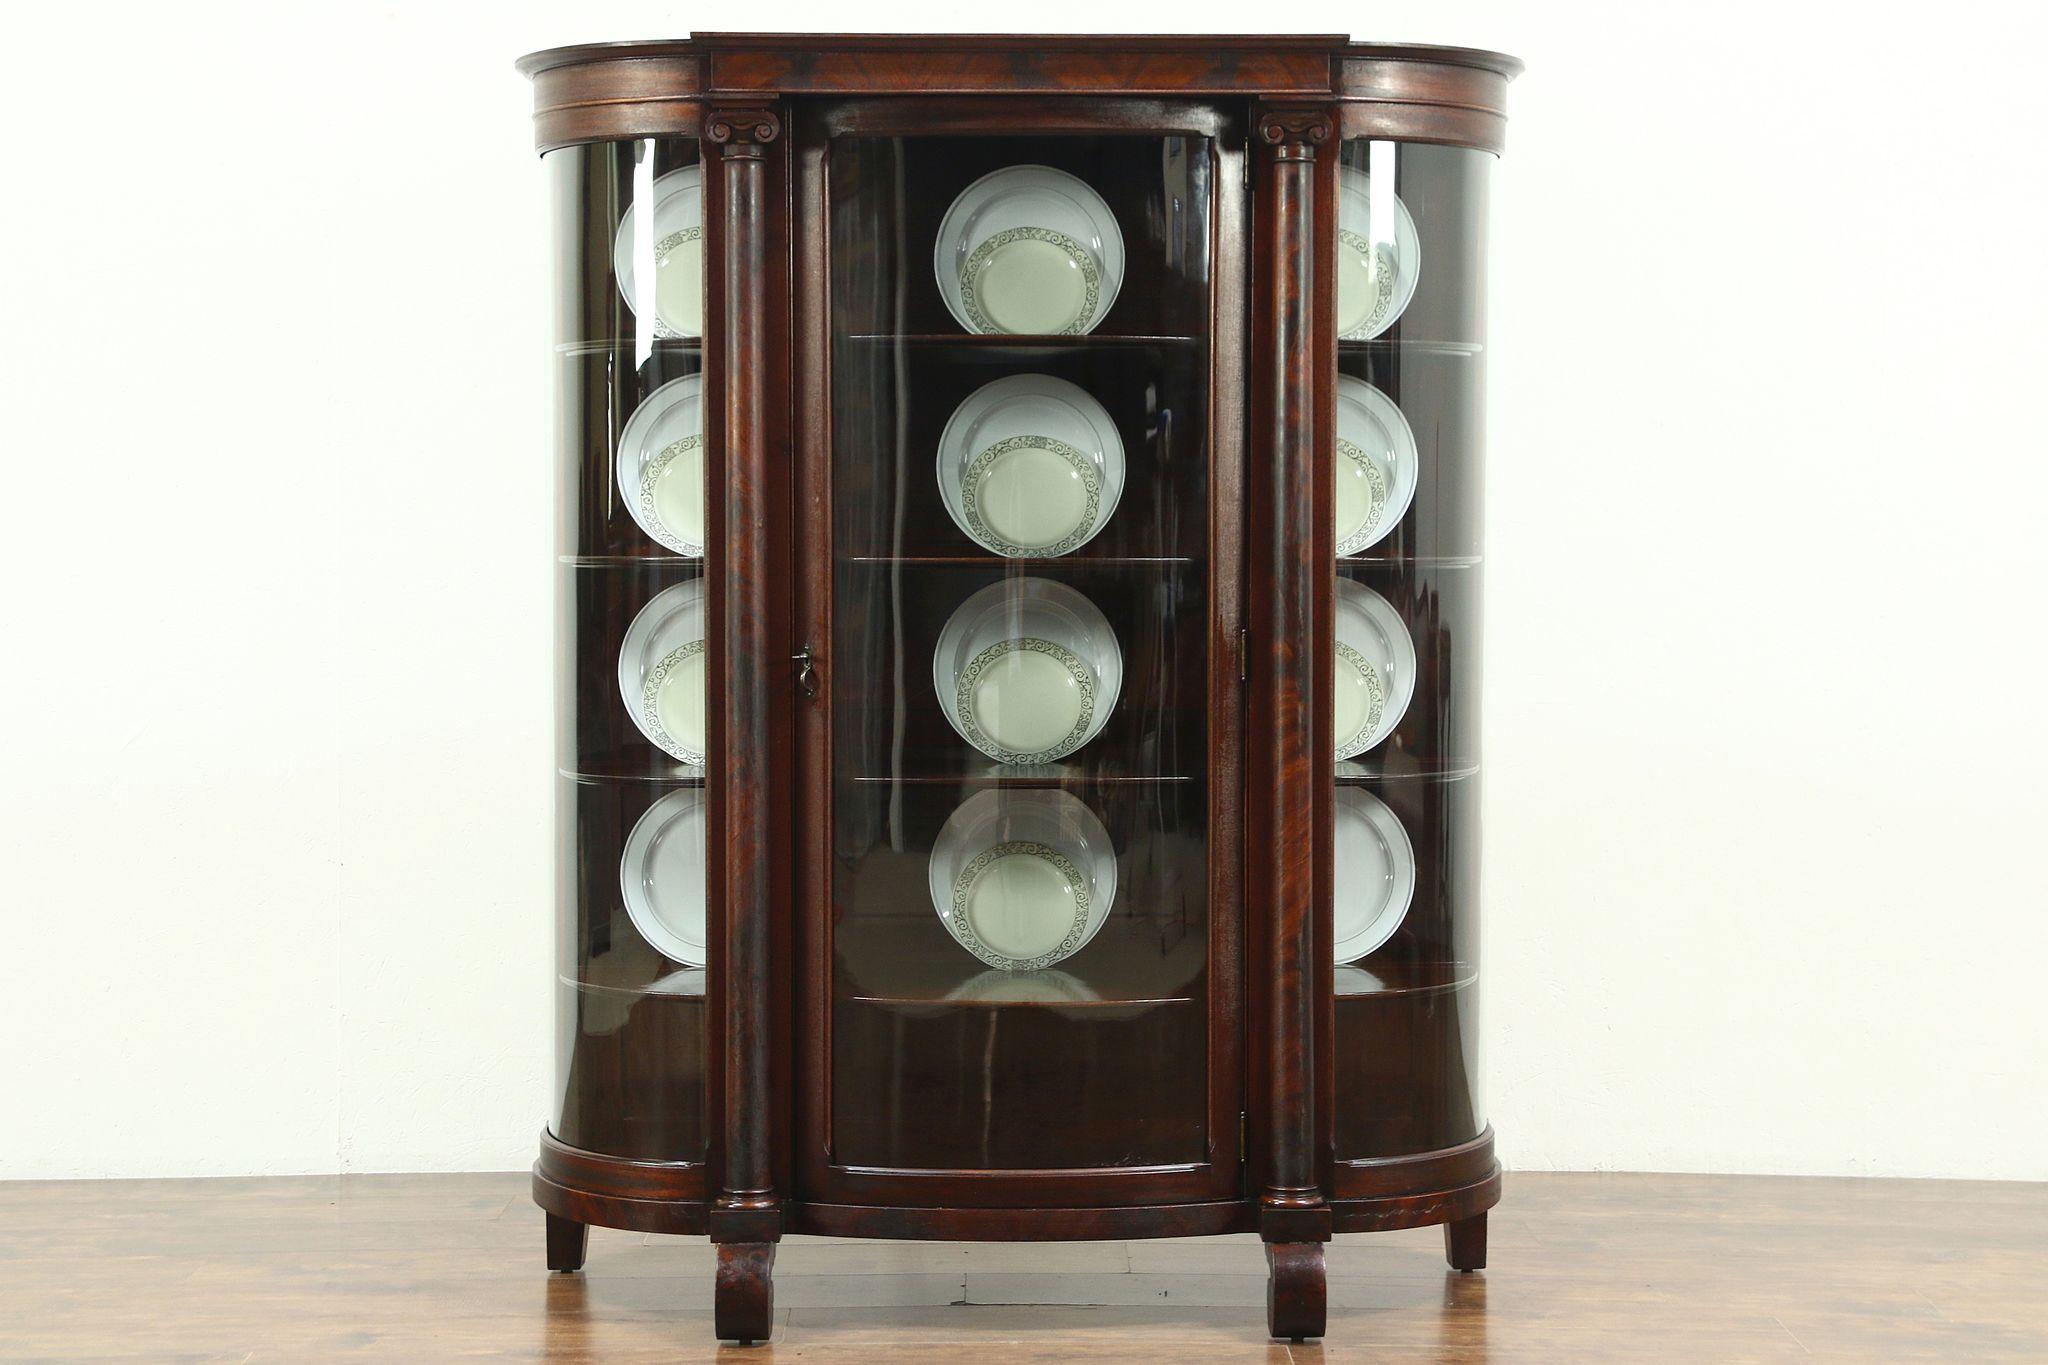 Genial Curved Glass Antique 1900 Empire Mahogany Curio Or China Cabinet #28843